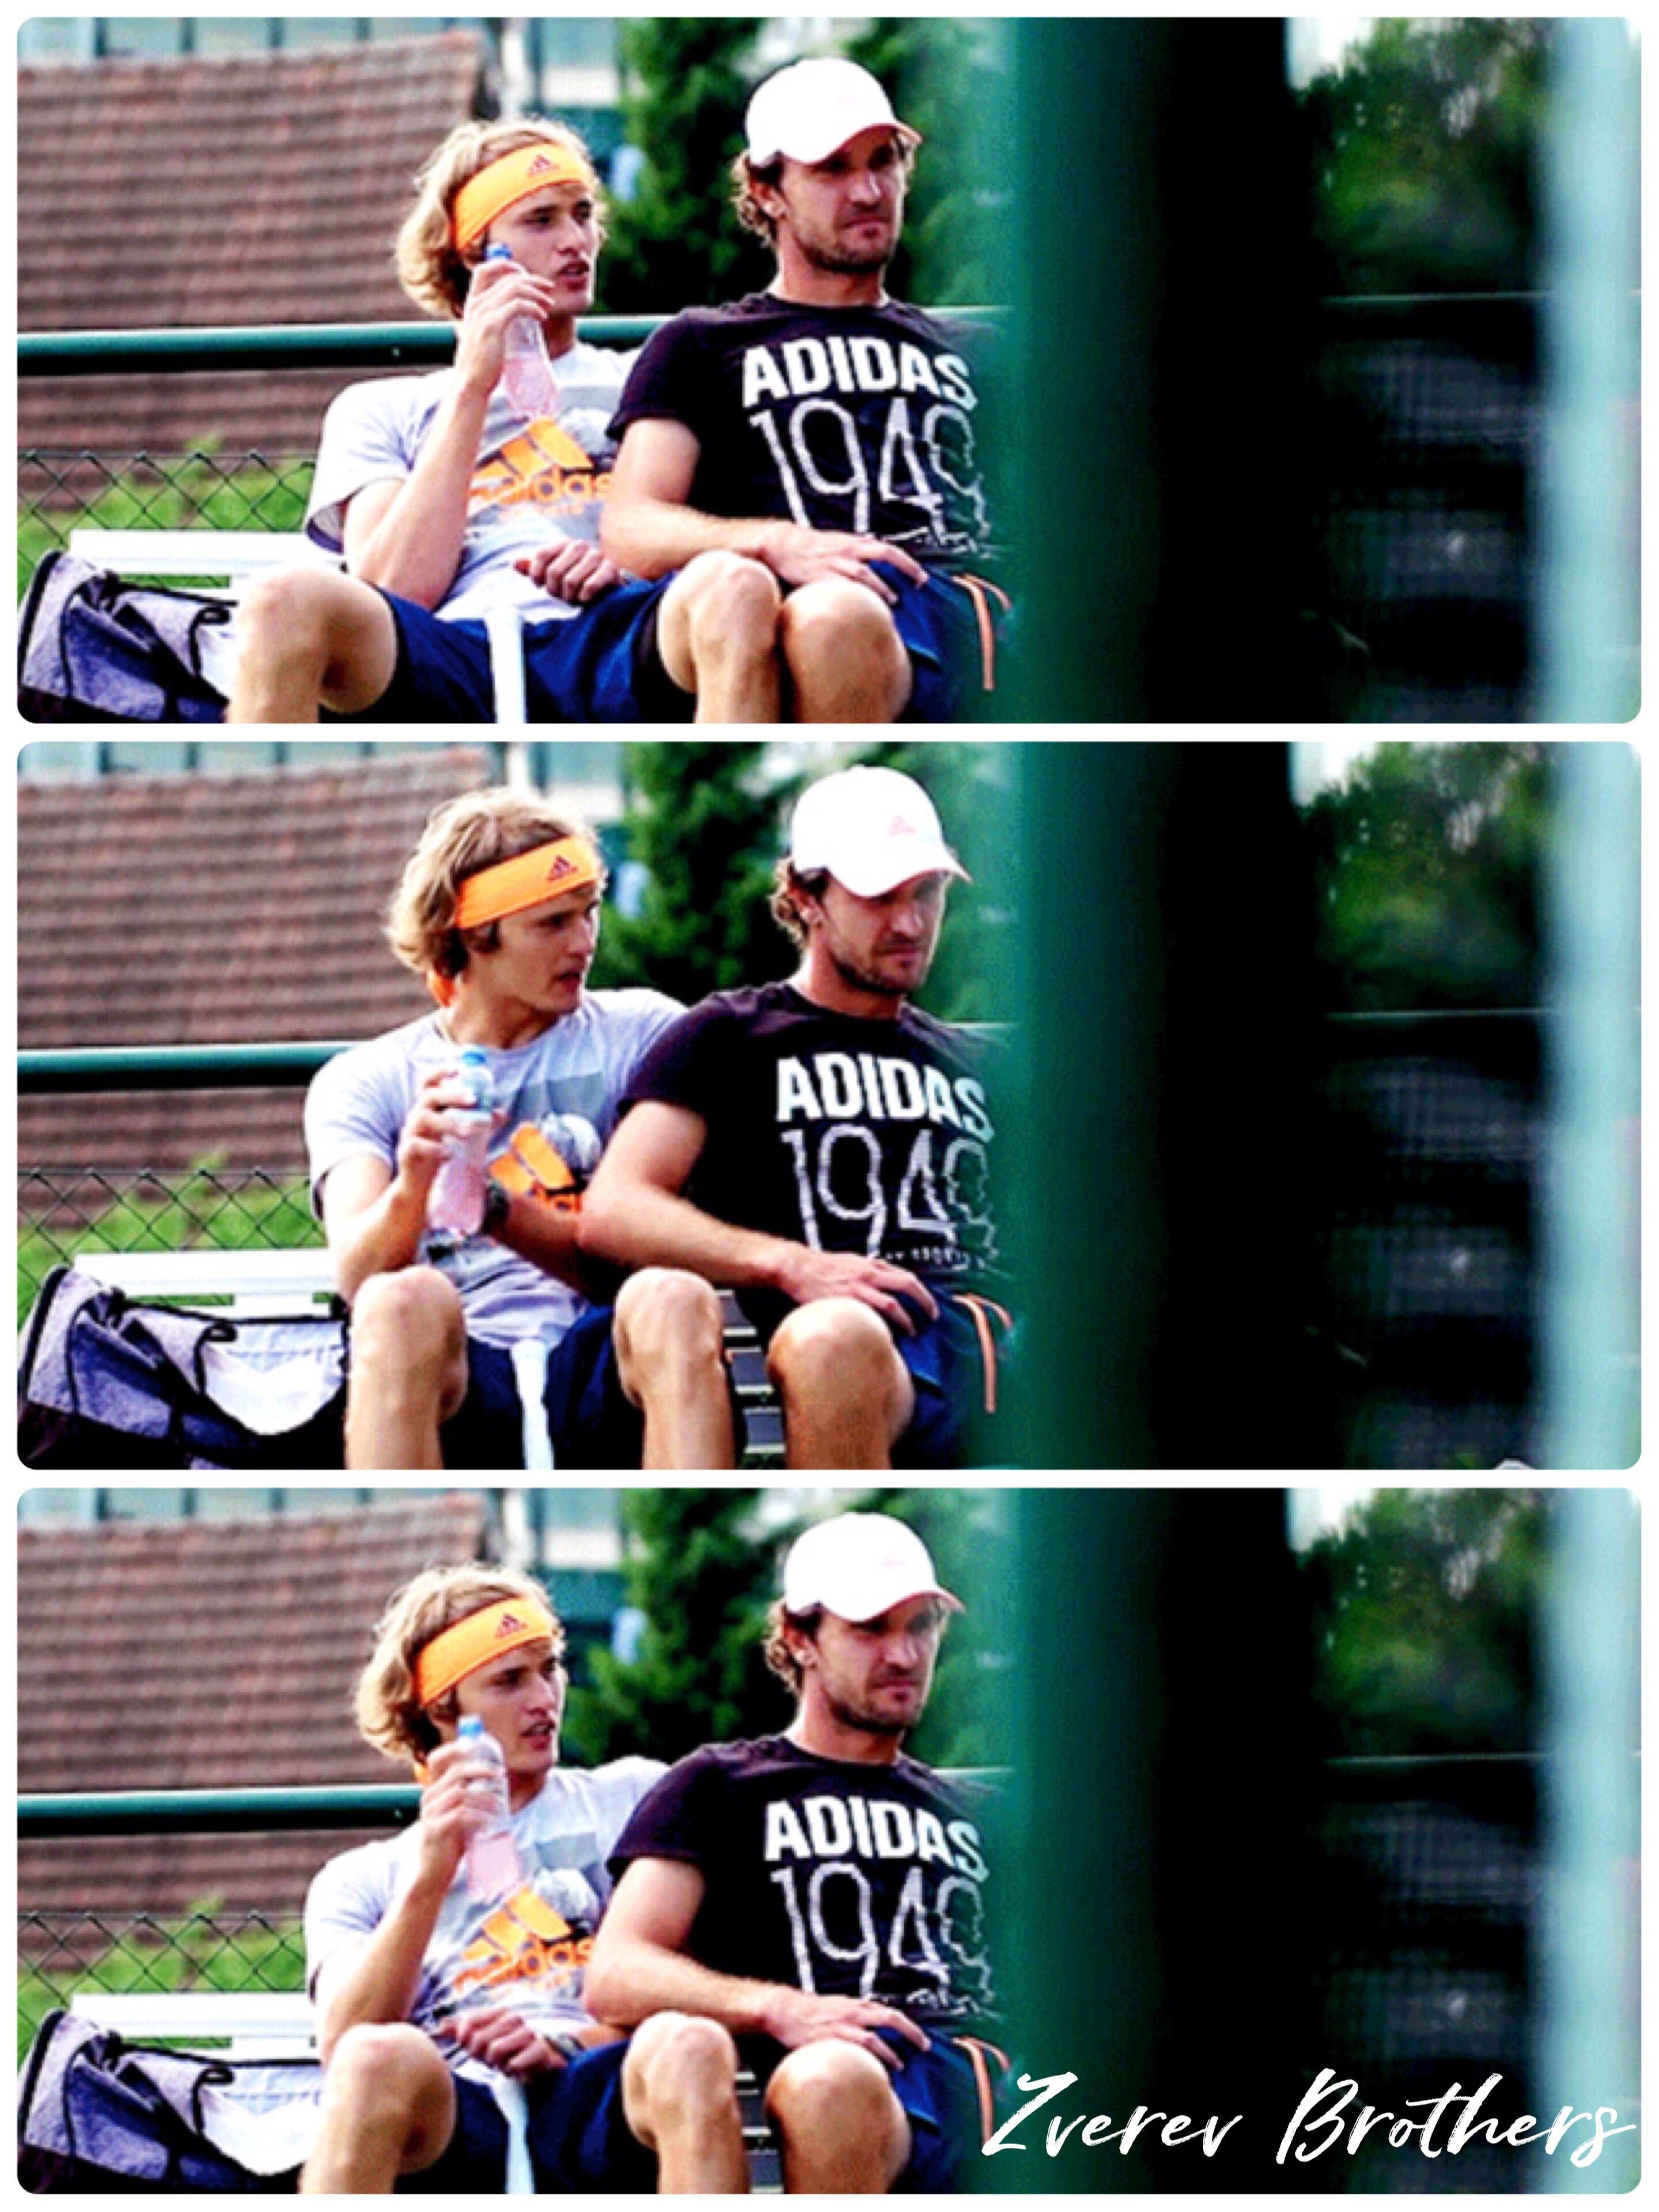 Little Mess Zverev Brothers From Atpworldtour Com Tenis